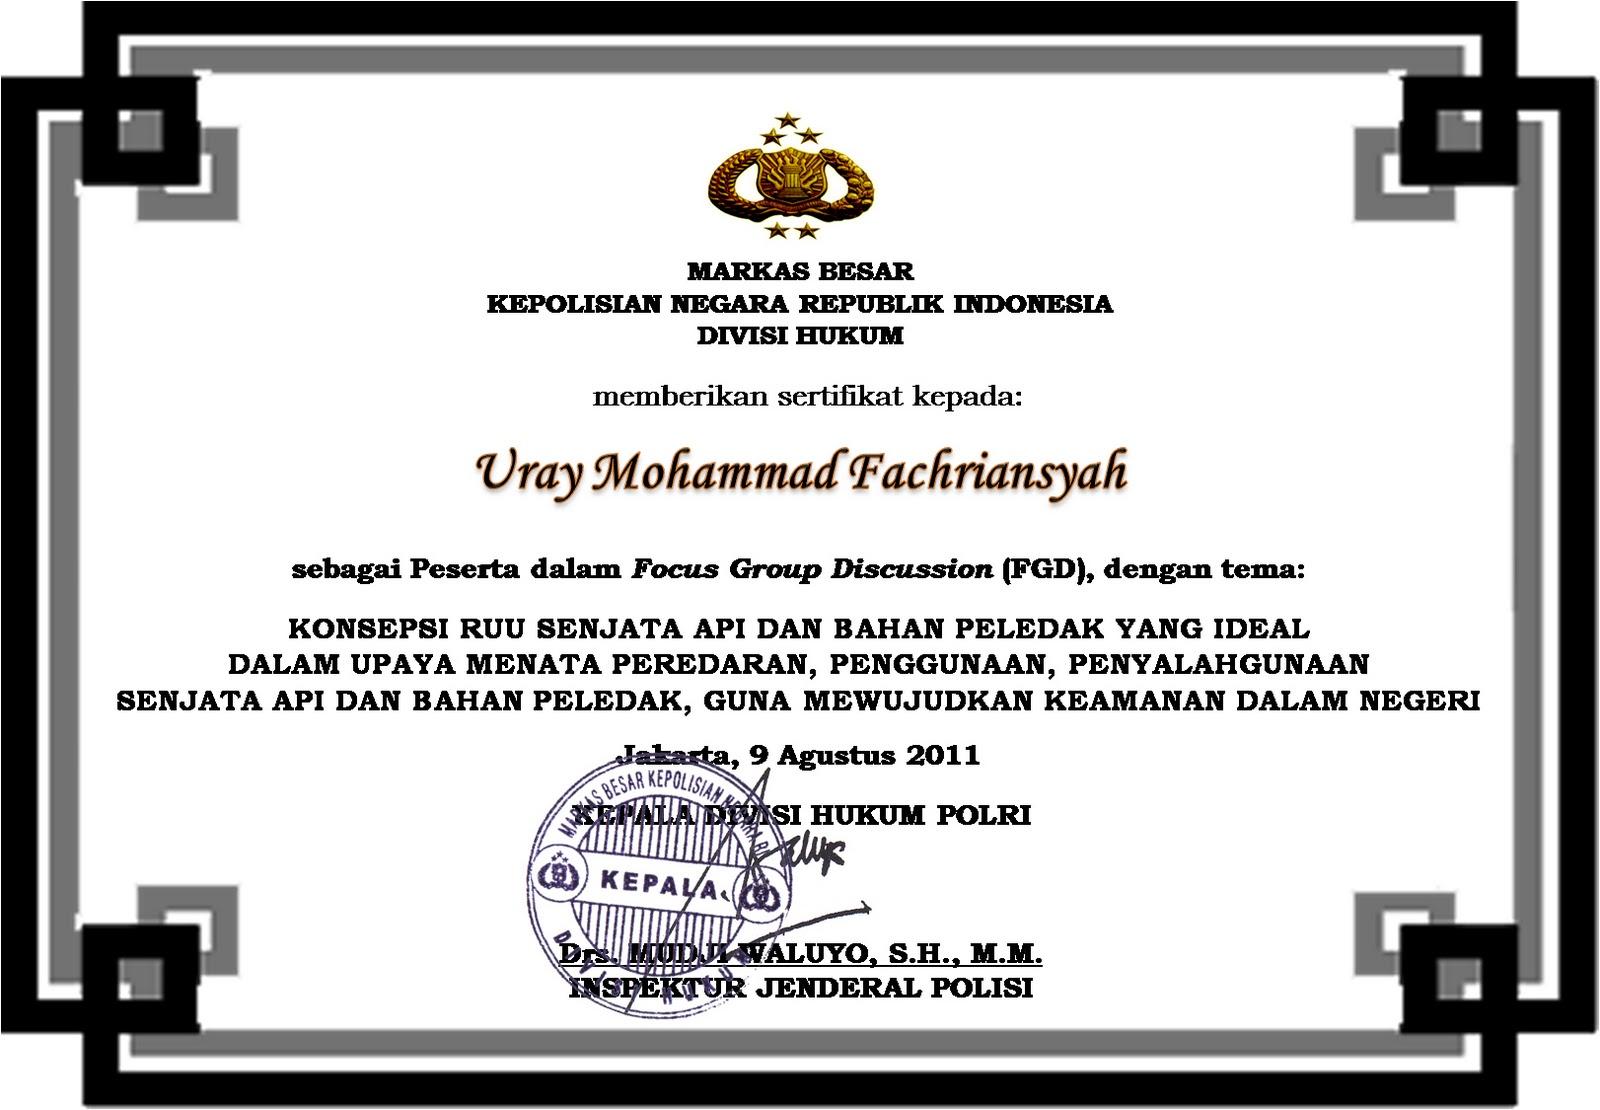 Undang Undang Tentang Penyimpangan Sosial Undang Undang No 6 Tahun 2014 Tentang Desa Slideshare Uray Fachriansyah Kegiatan Dan Sertifikat Juli Desember 2011